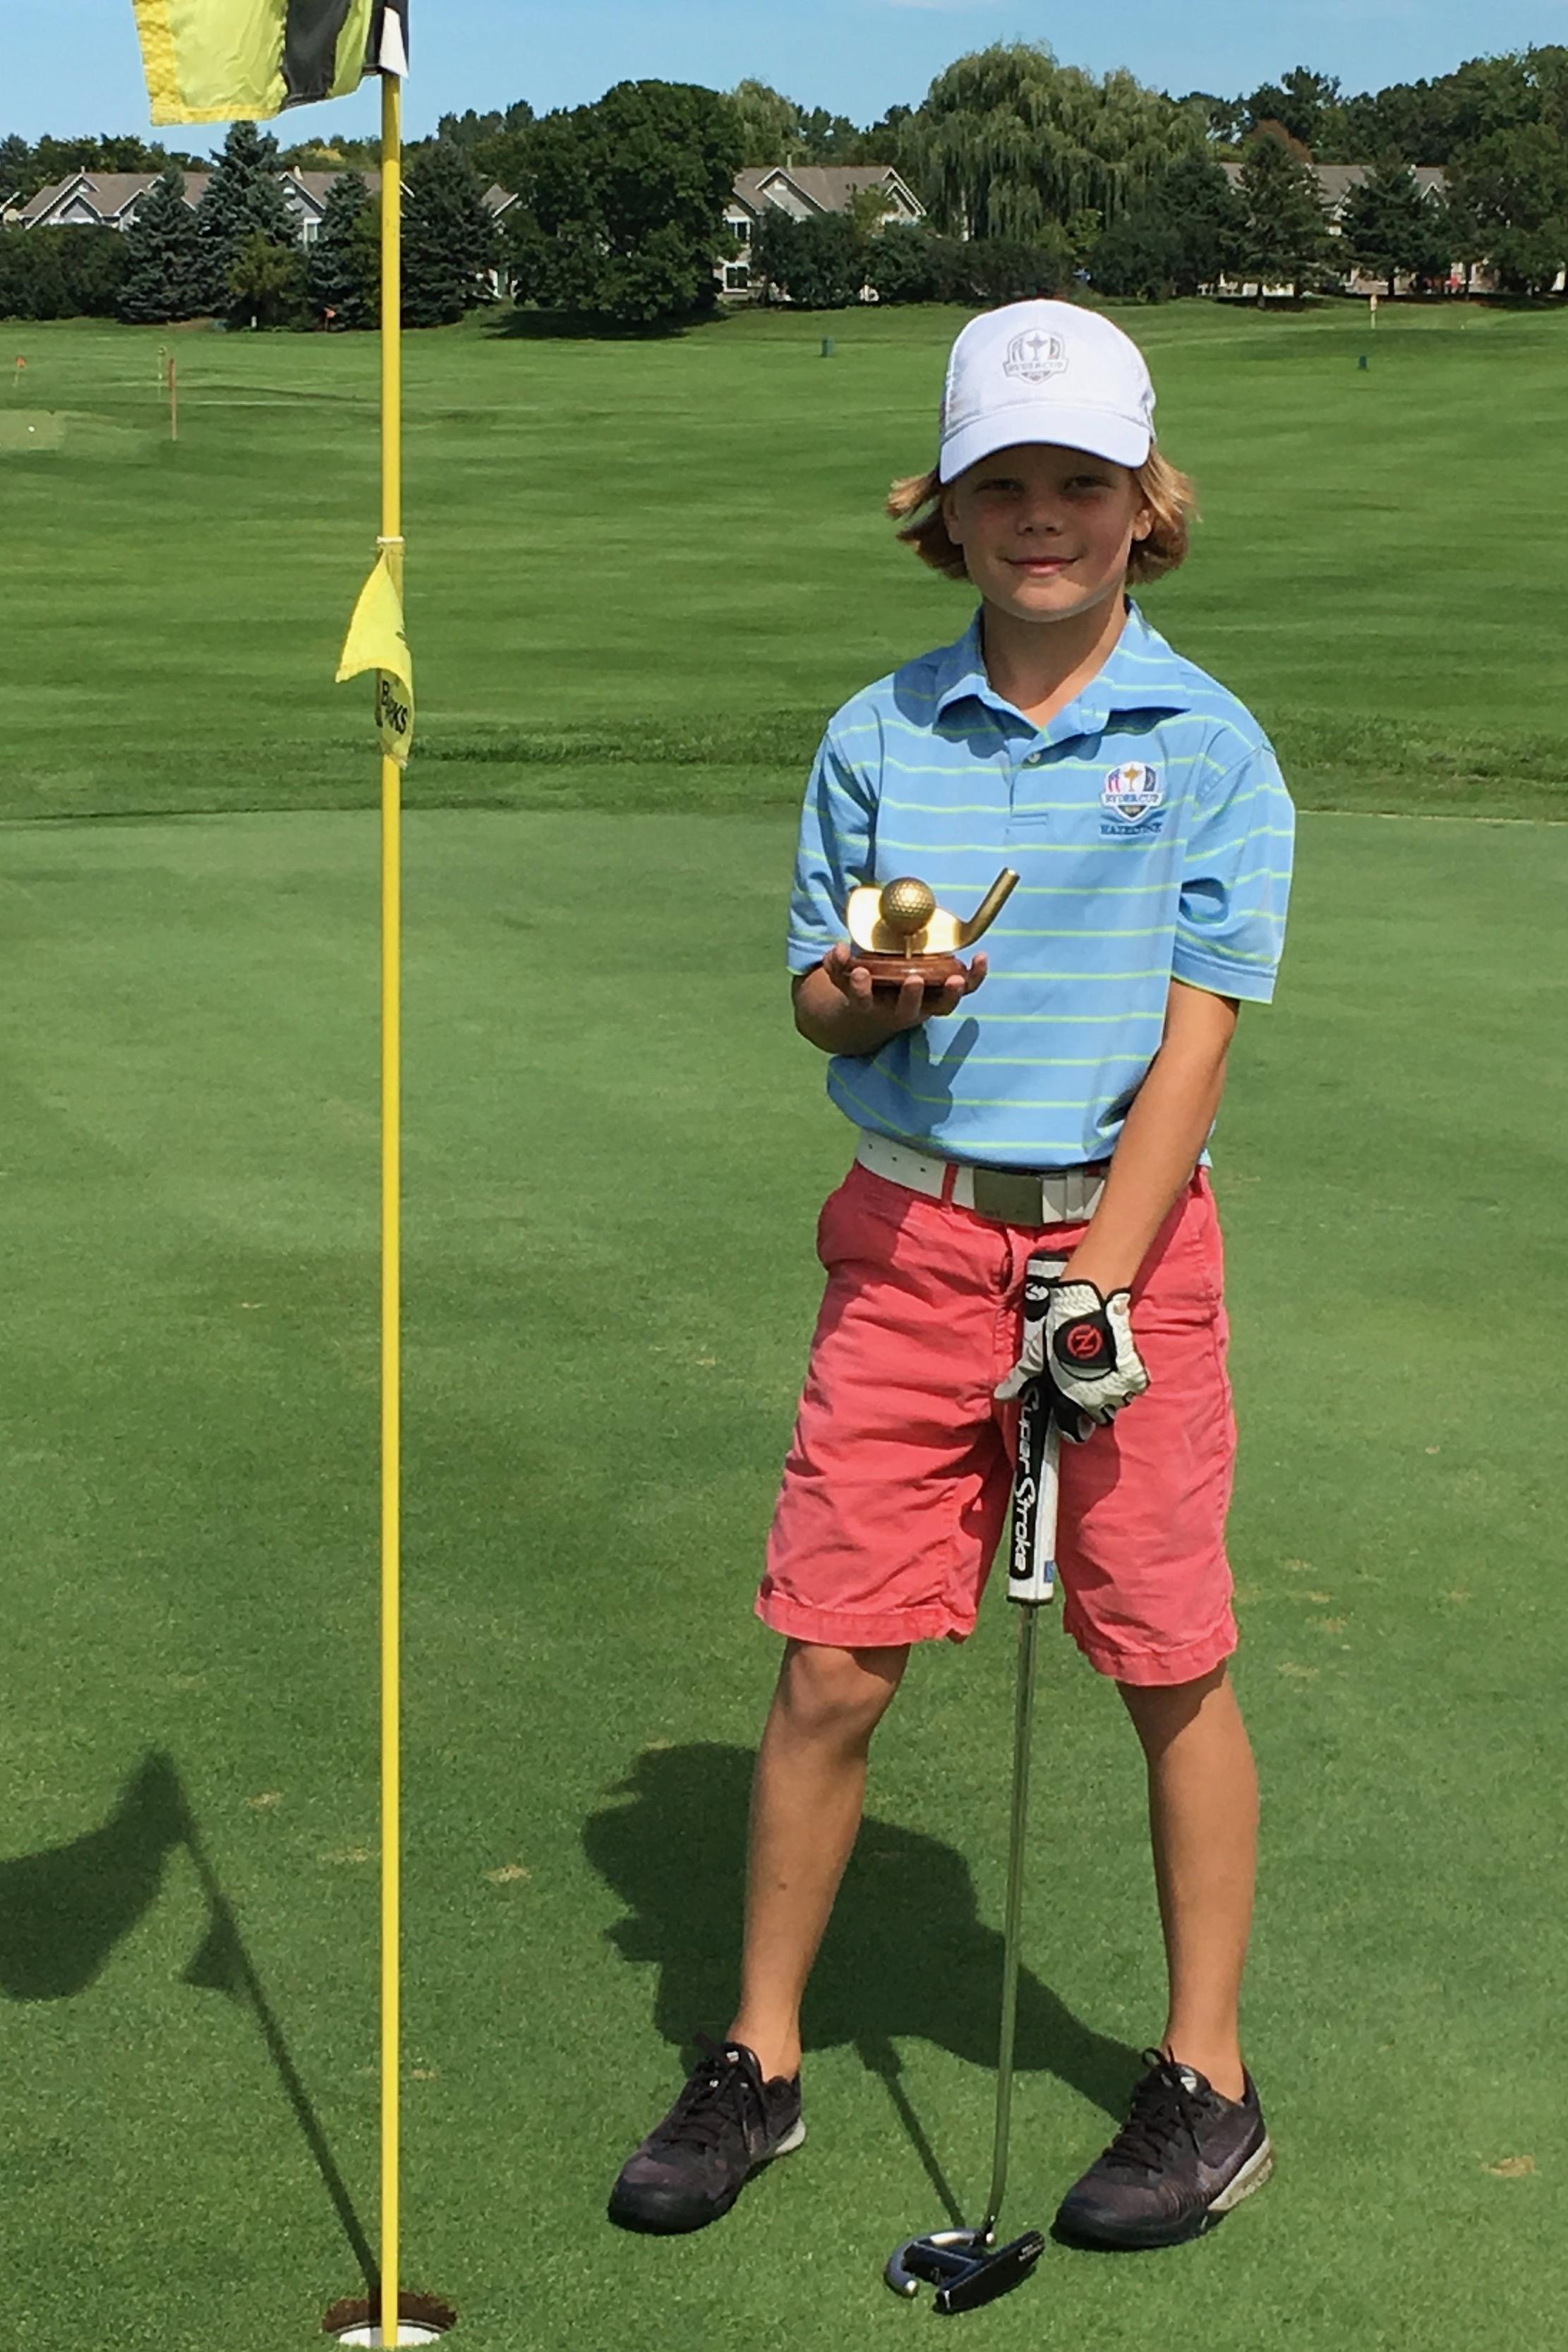 Ben Jackson - HA 2016 Champion Golfer of the Year